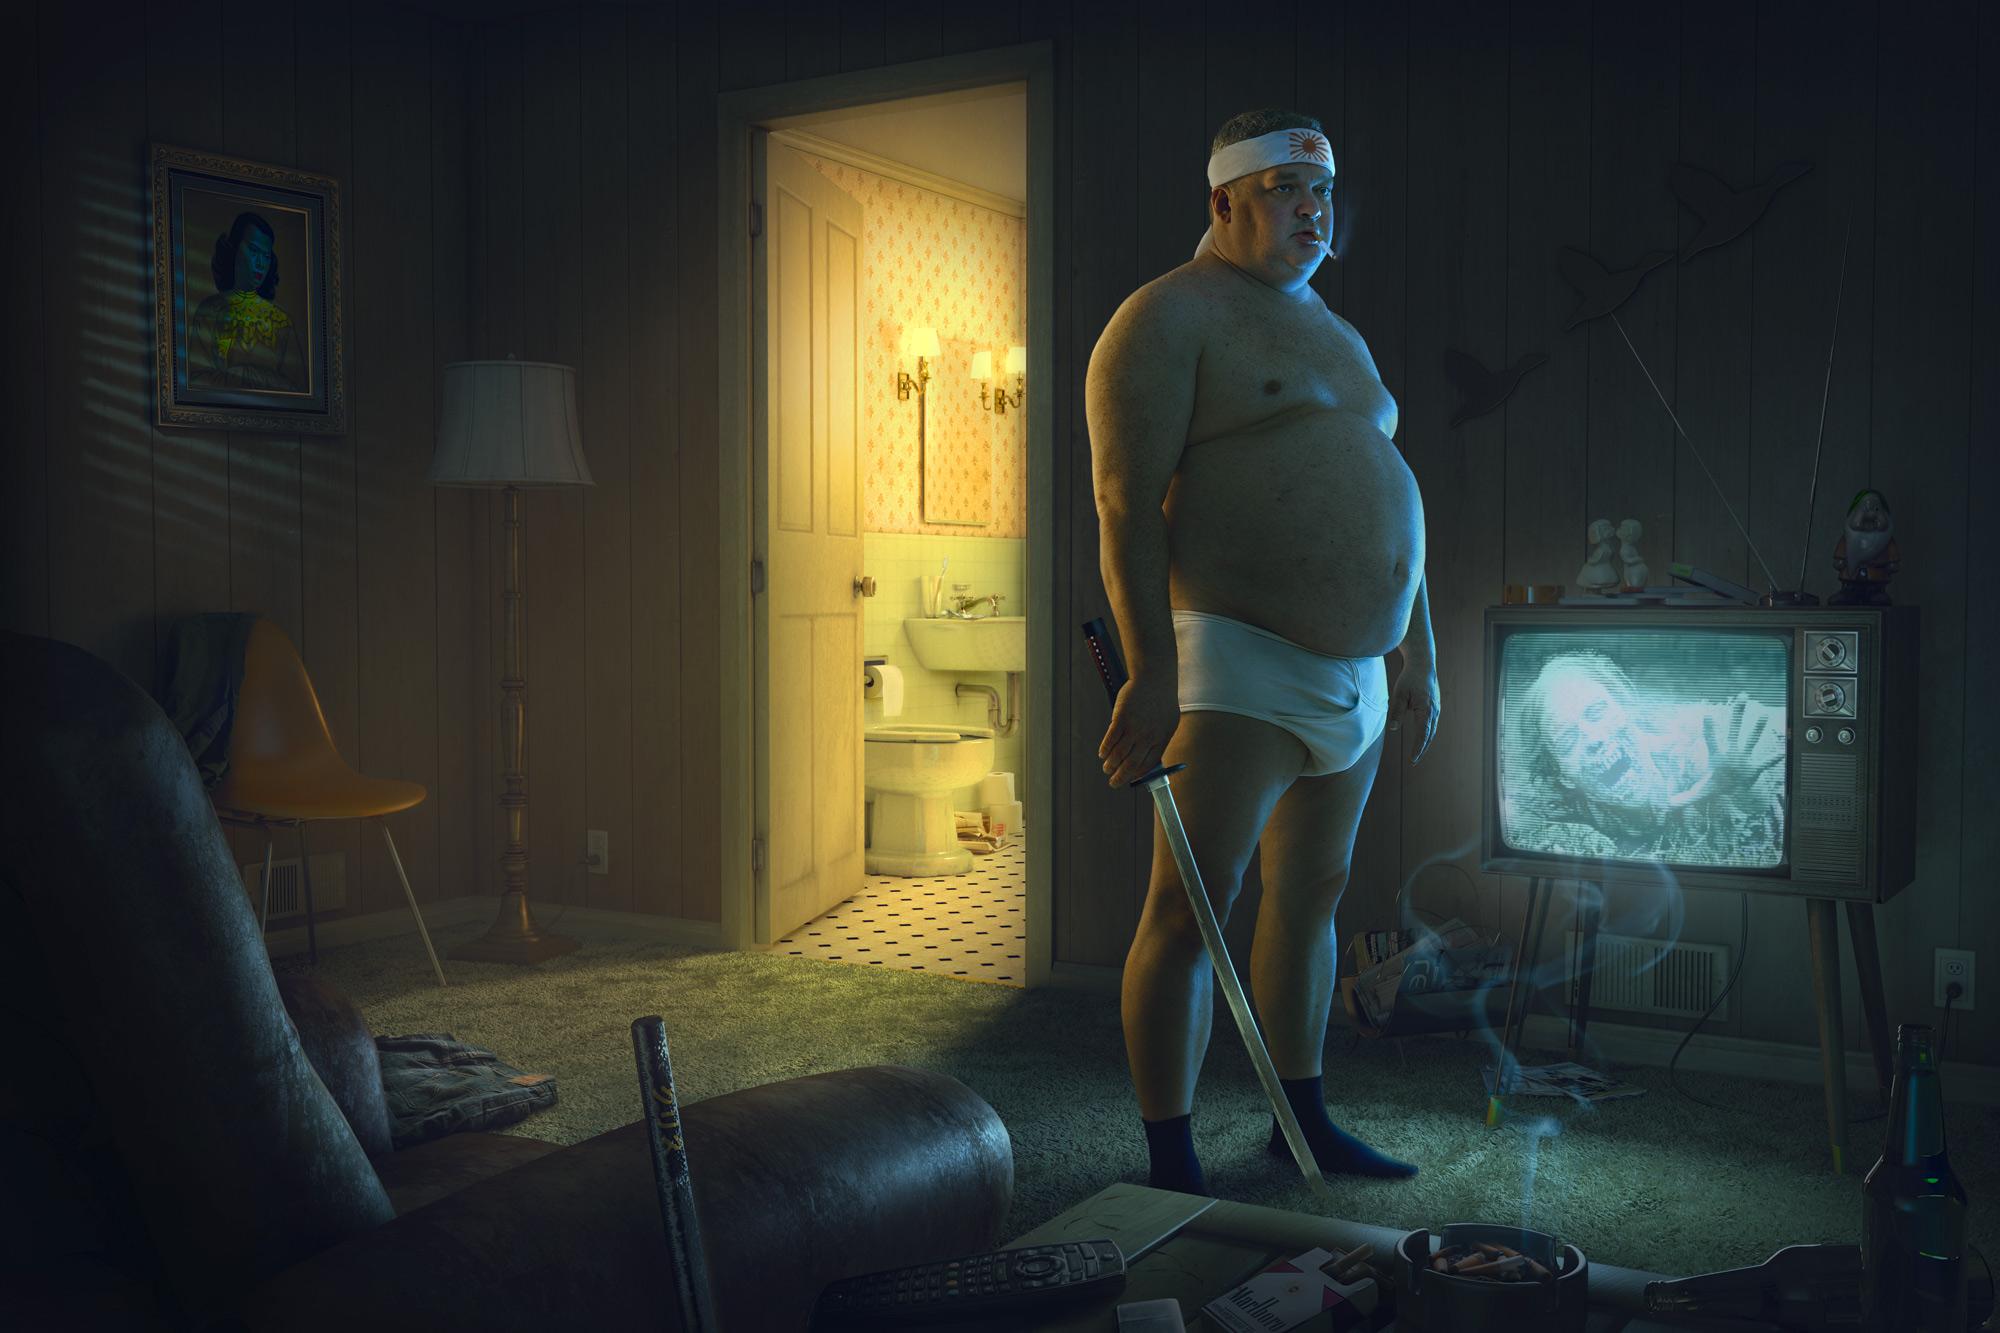 Chris Clor man in underpants in living room with sword